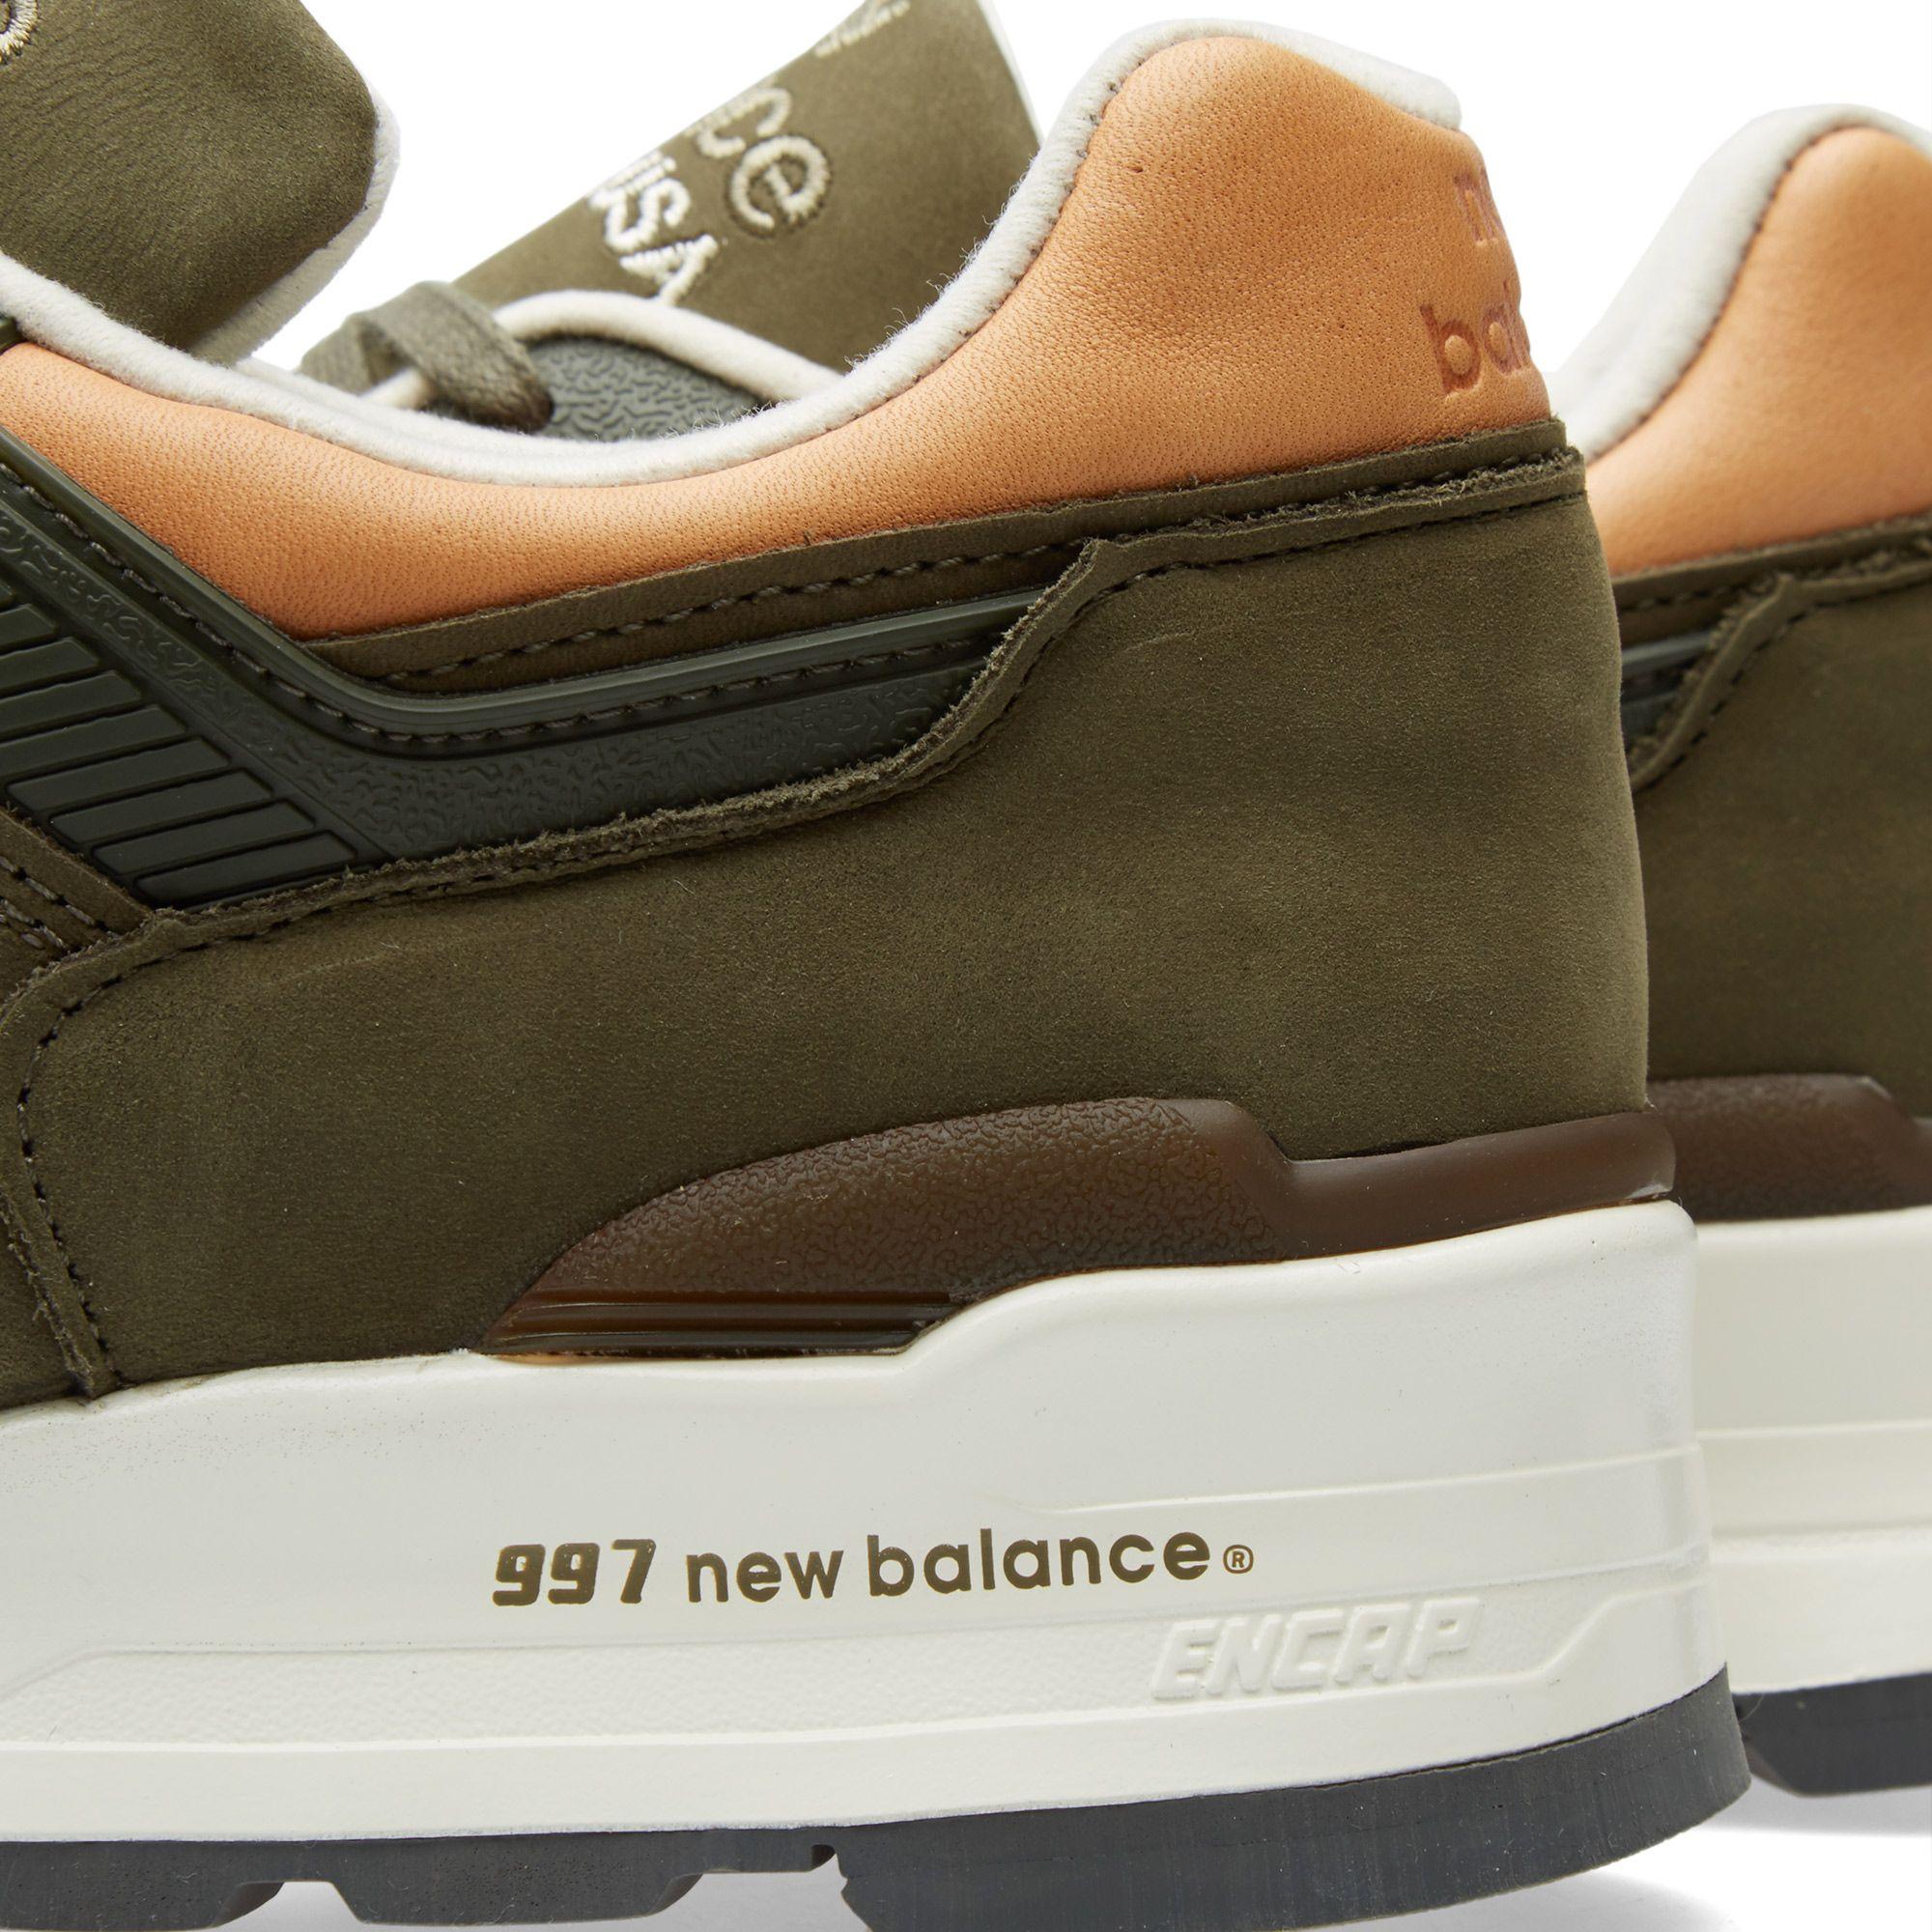 new balance 997 dcs